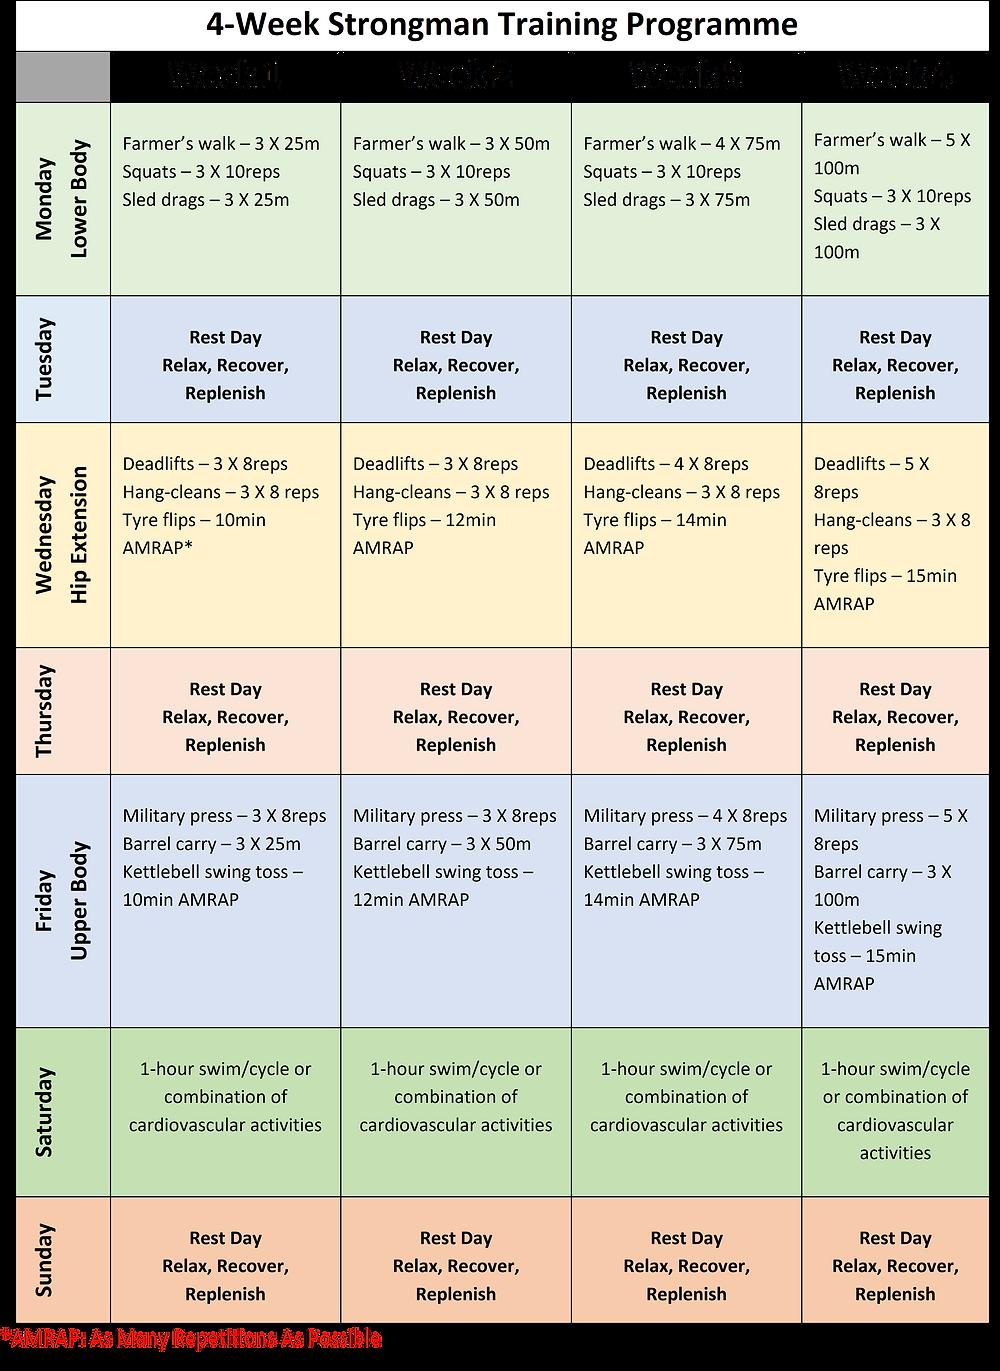 a 4-week strongman training programme